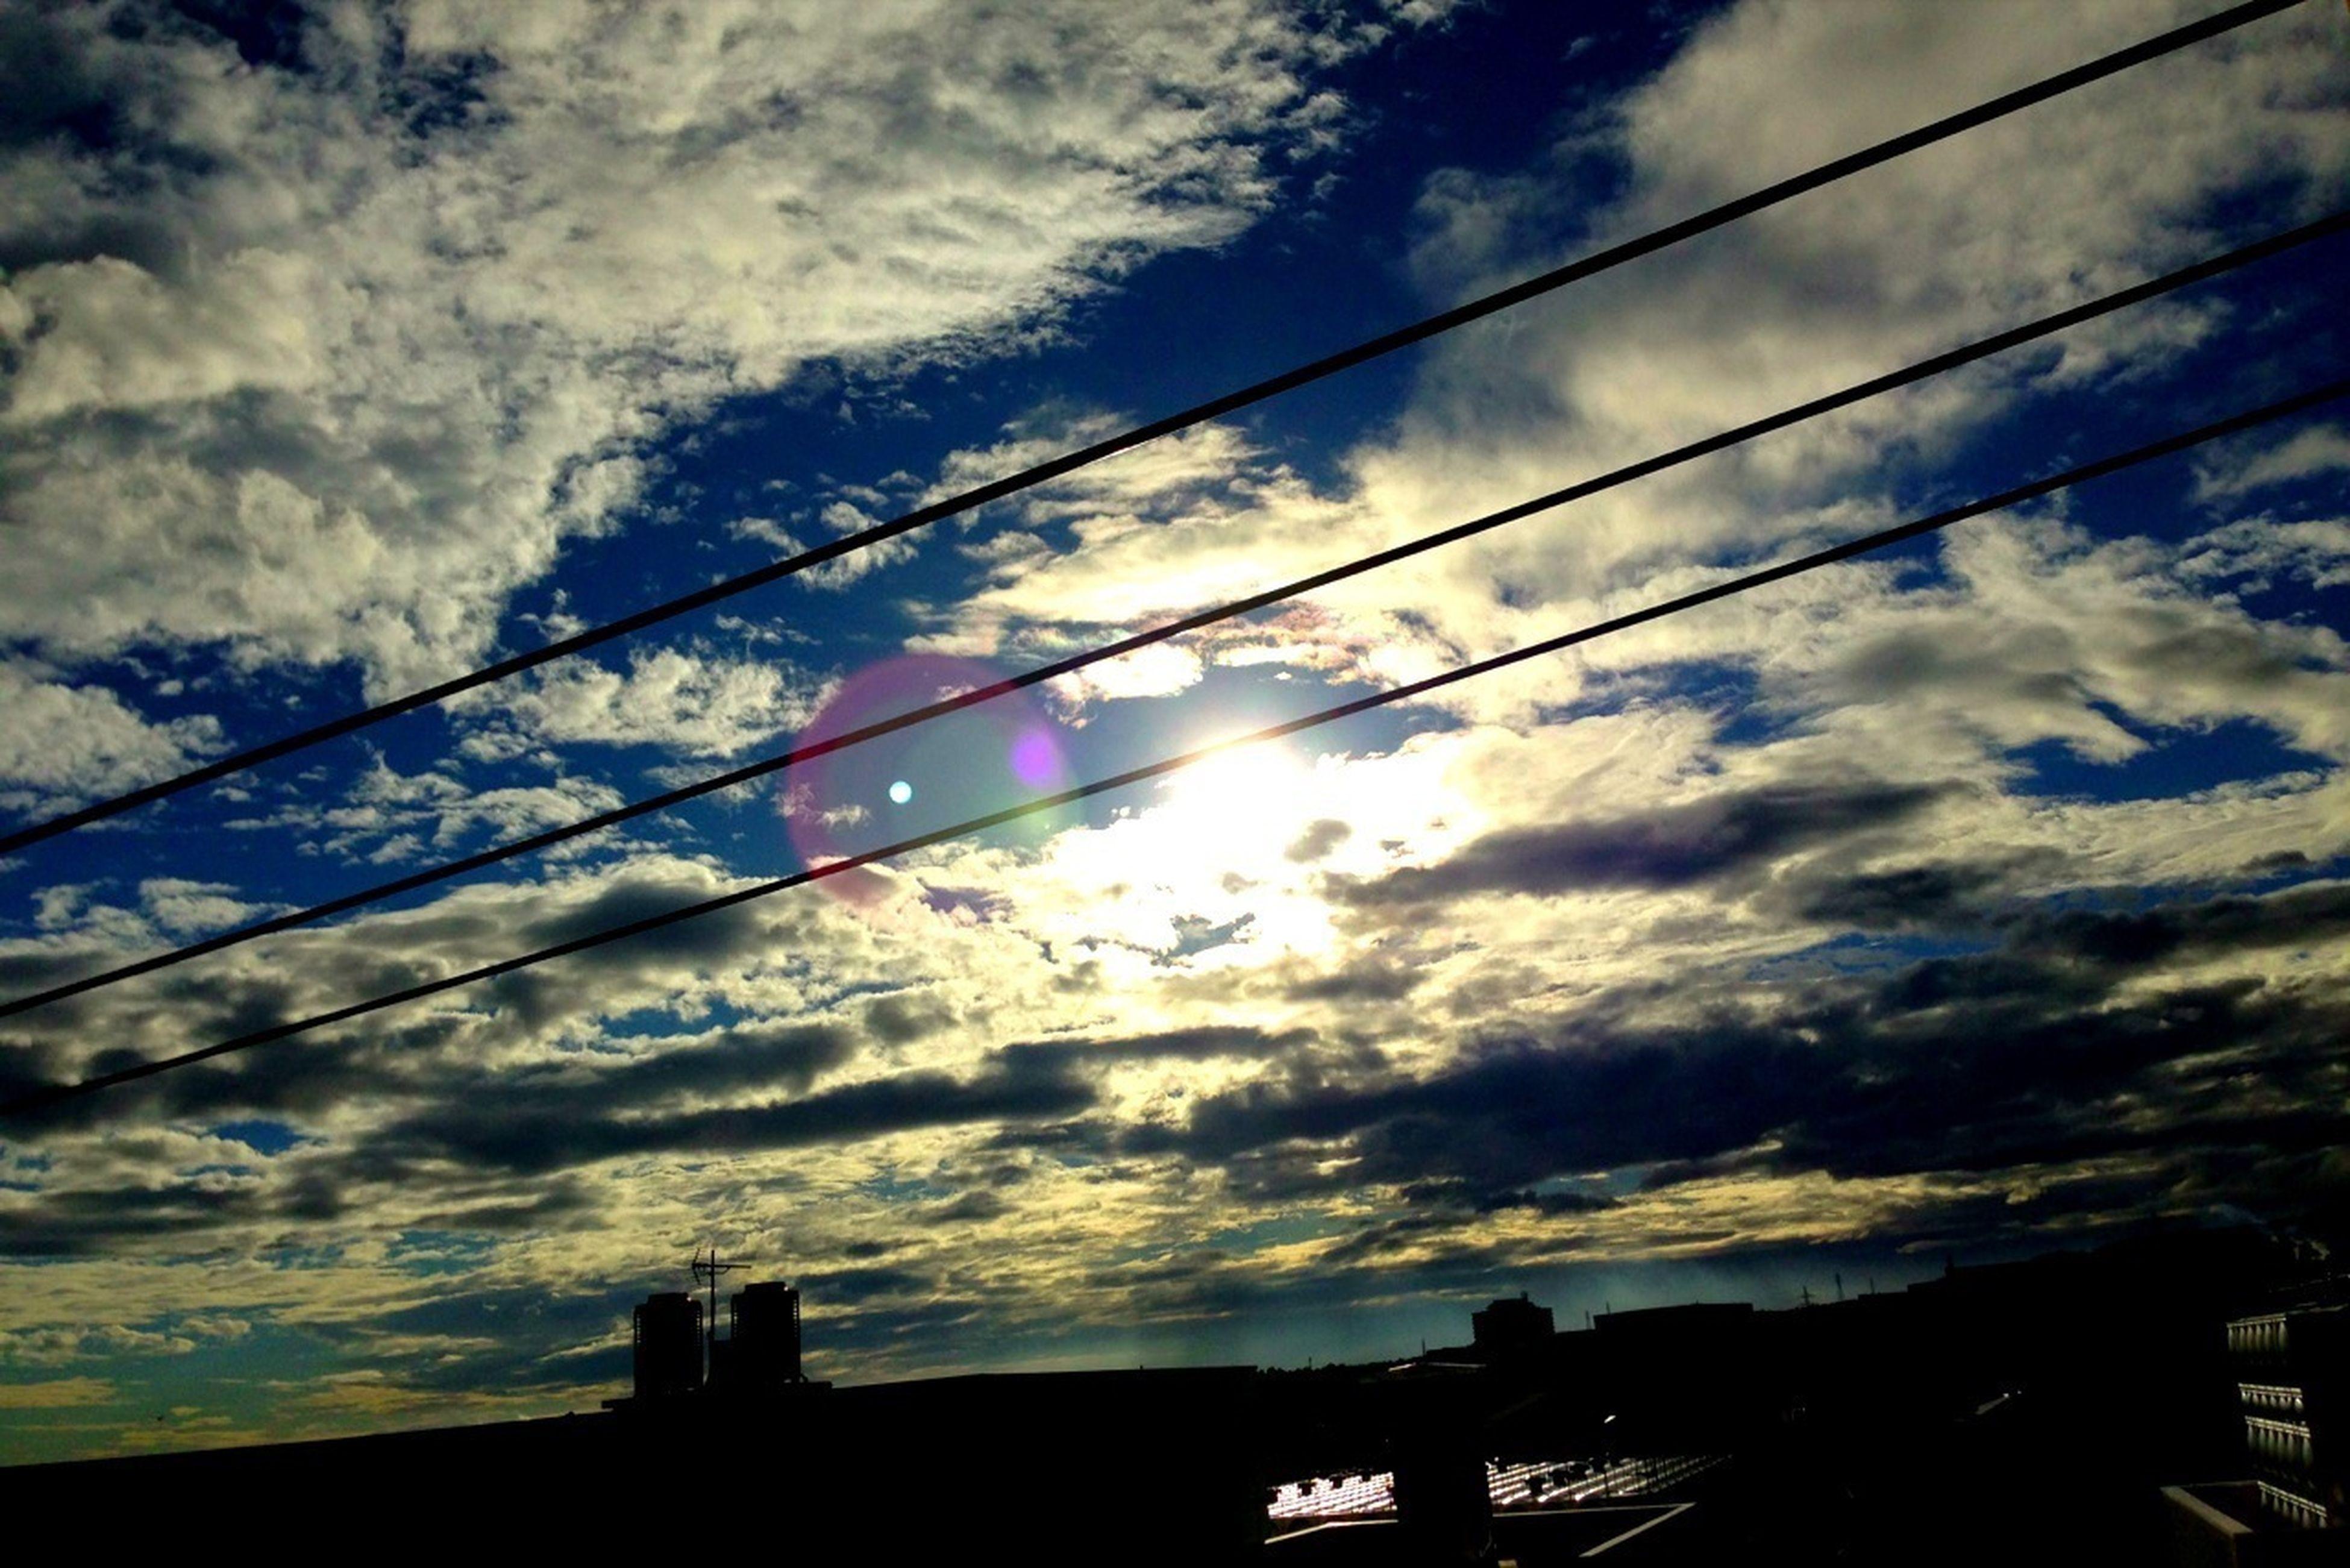 low angle view, sky, silhouette, cloud - sky, built structure, architecture, cloudy, cloud, building exterior, sunset, outdoors, nature, dusk, connection, cable, city, power line, building, no people, sunlight